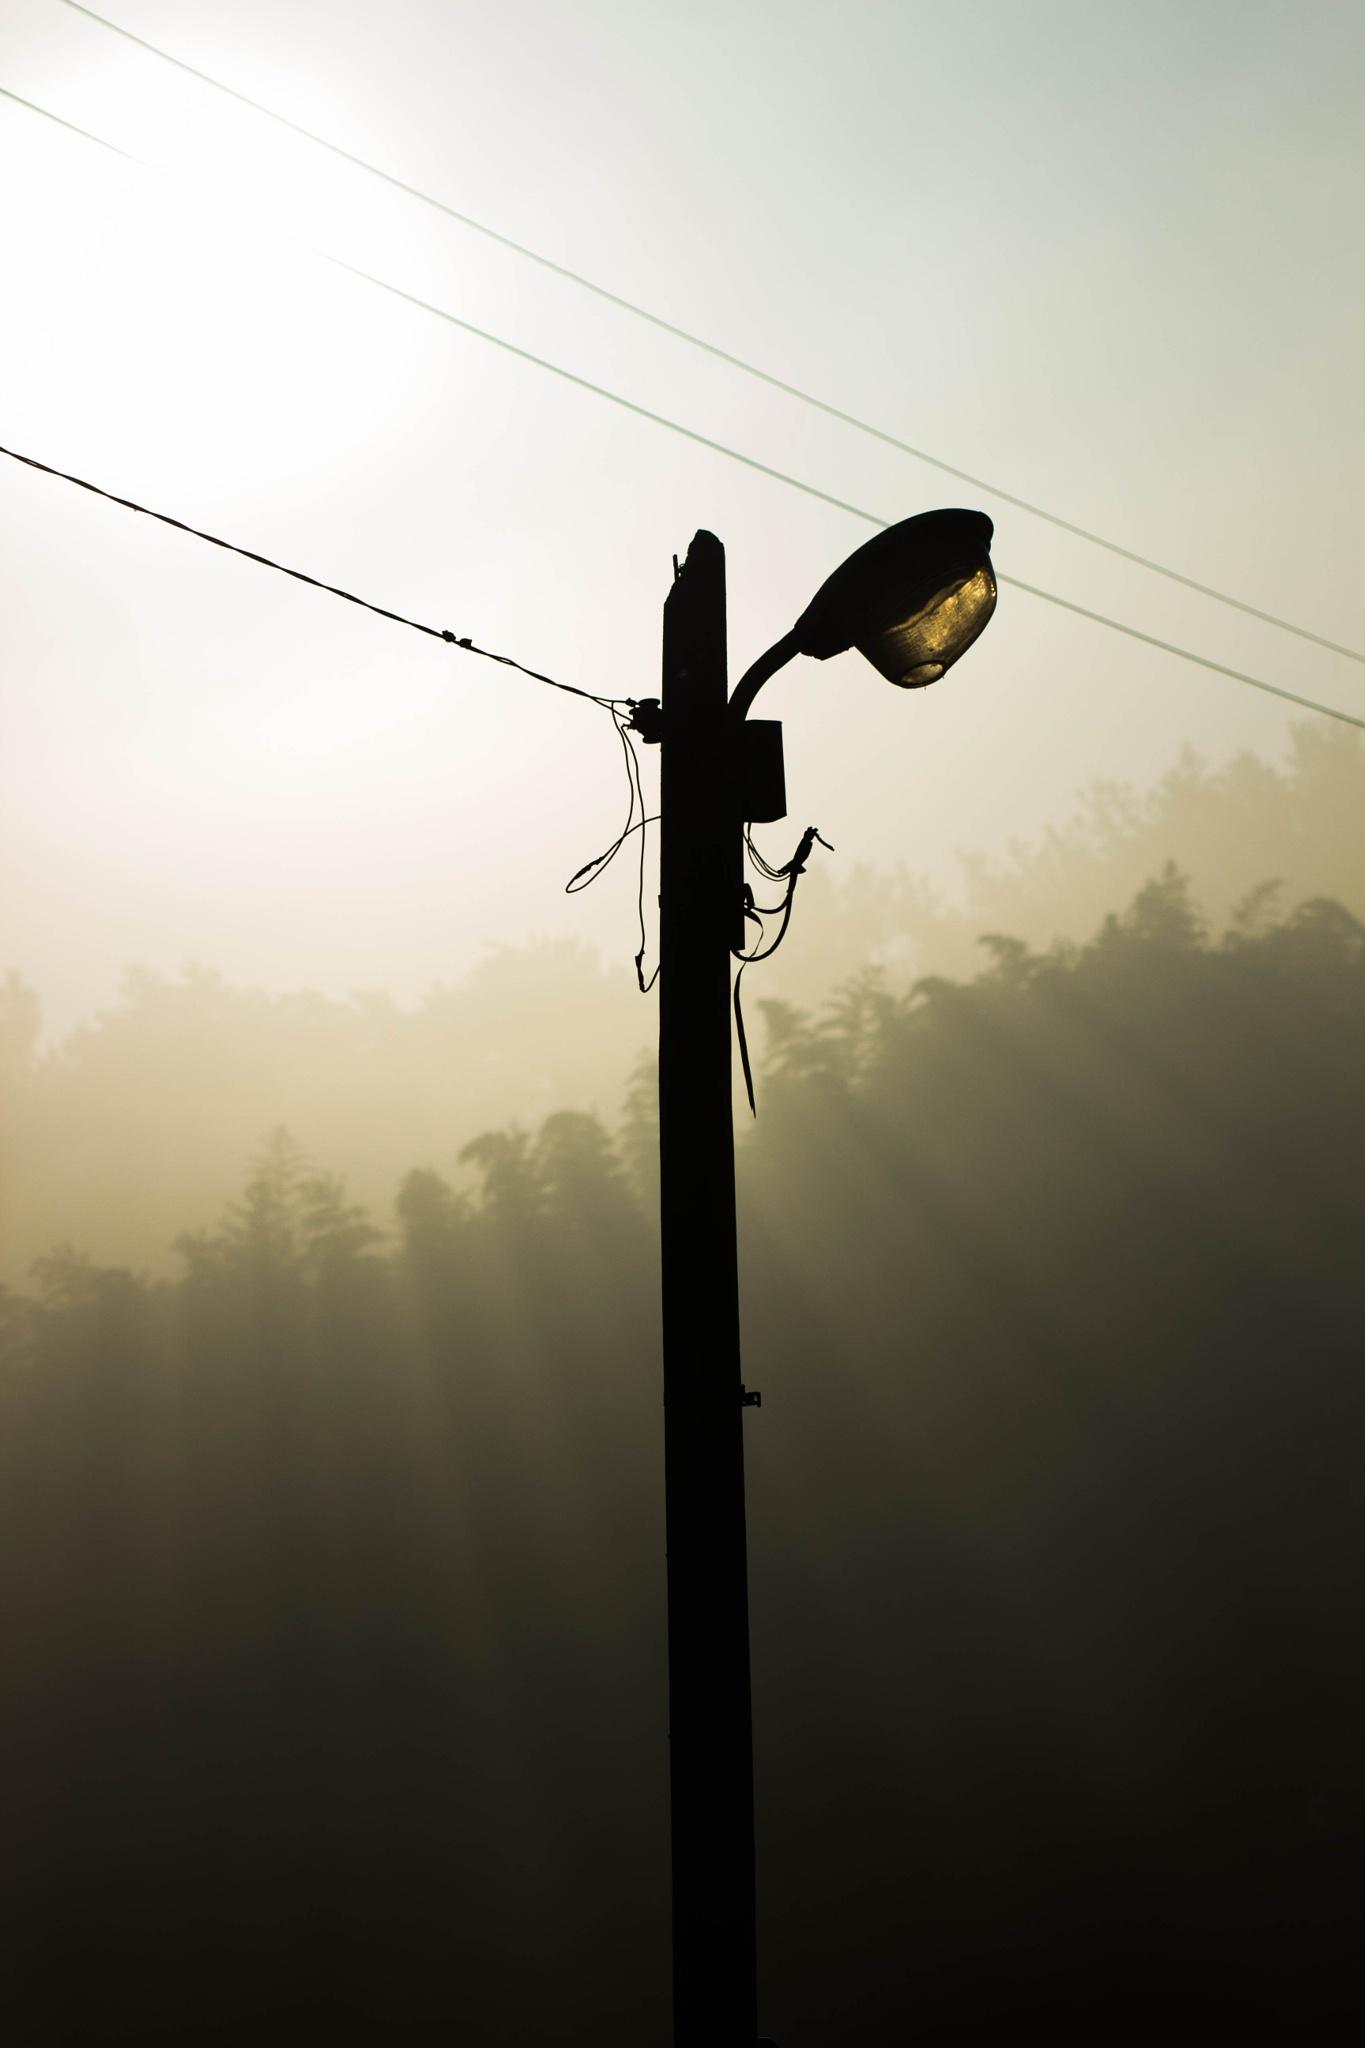 Streetlight off, Sunlight On by Muk